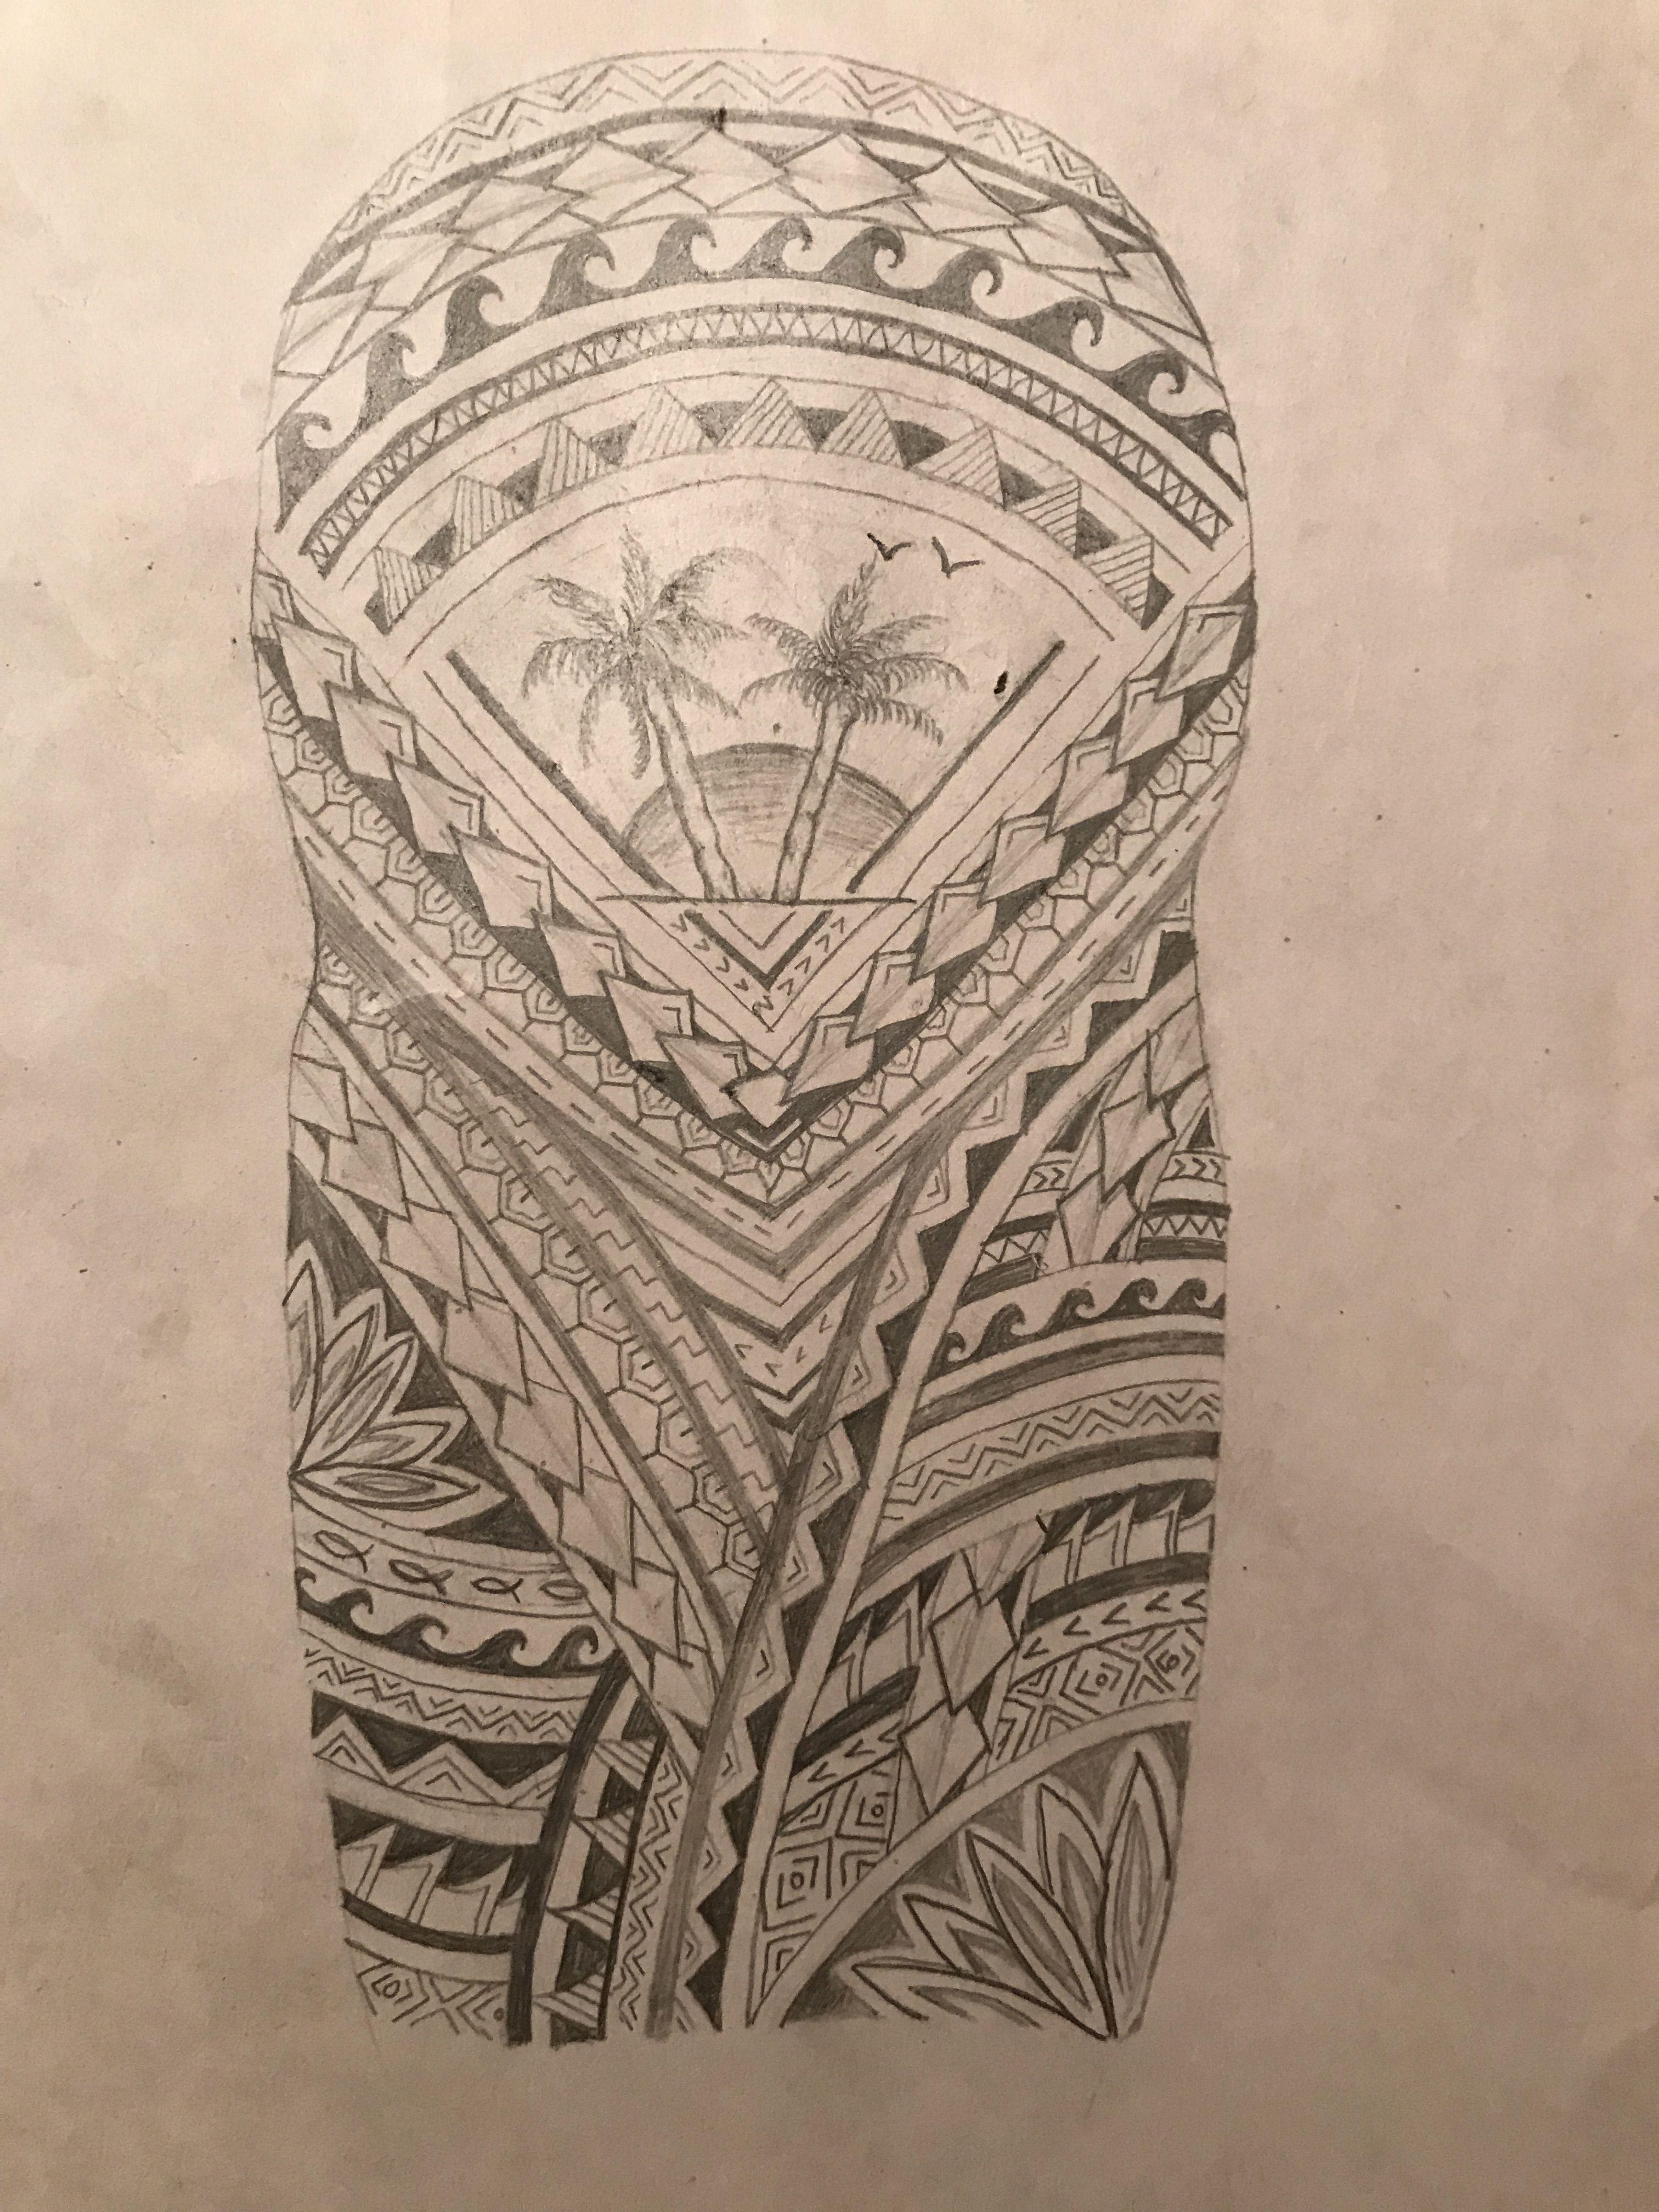 First Design Polynesian Half Sleeve With Tropical Theme Inkbyisabella Half Sleeve Tattoos Designs Half Sleeve Tattoos Drawings Half Sleeve Tattoo